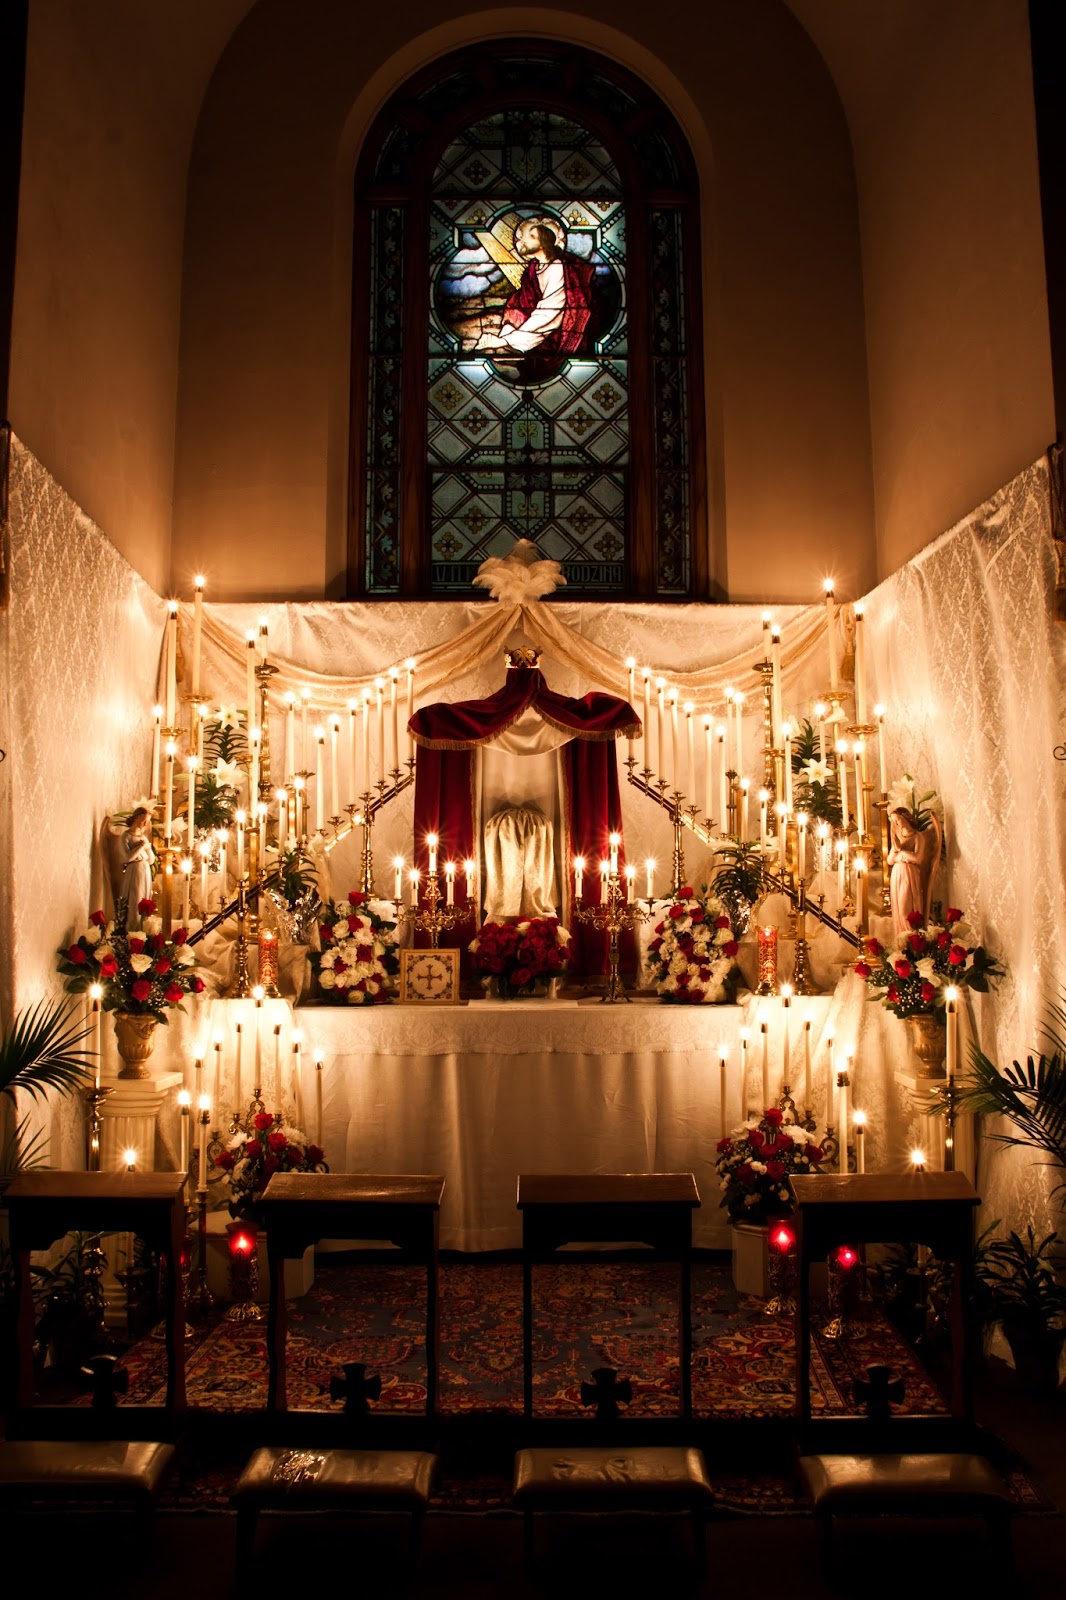 Hour of Adoration at Nashua